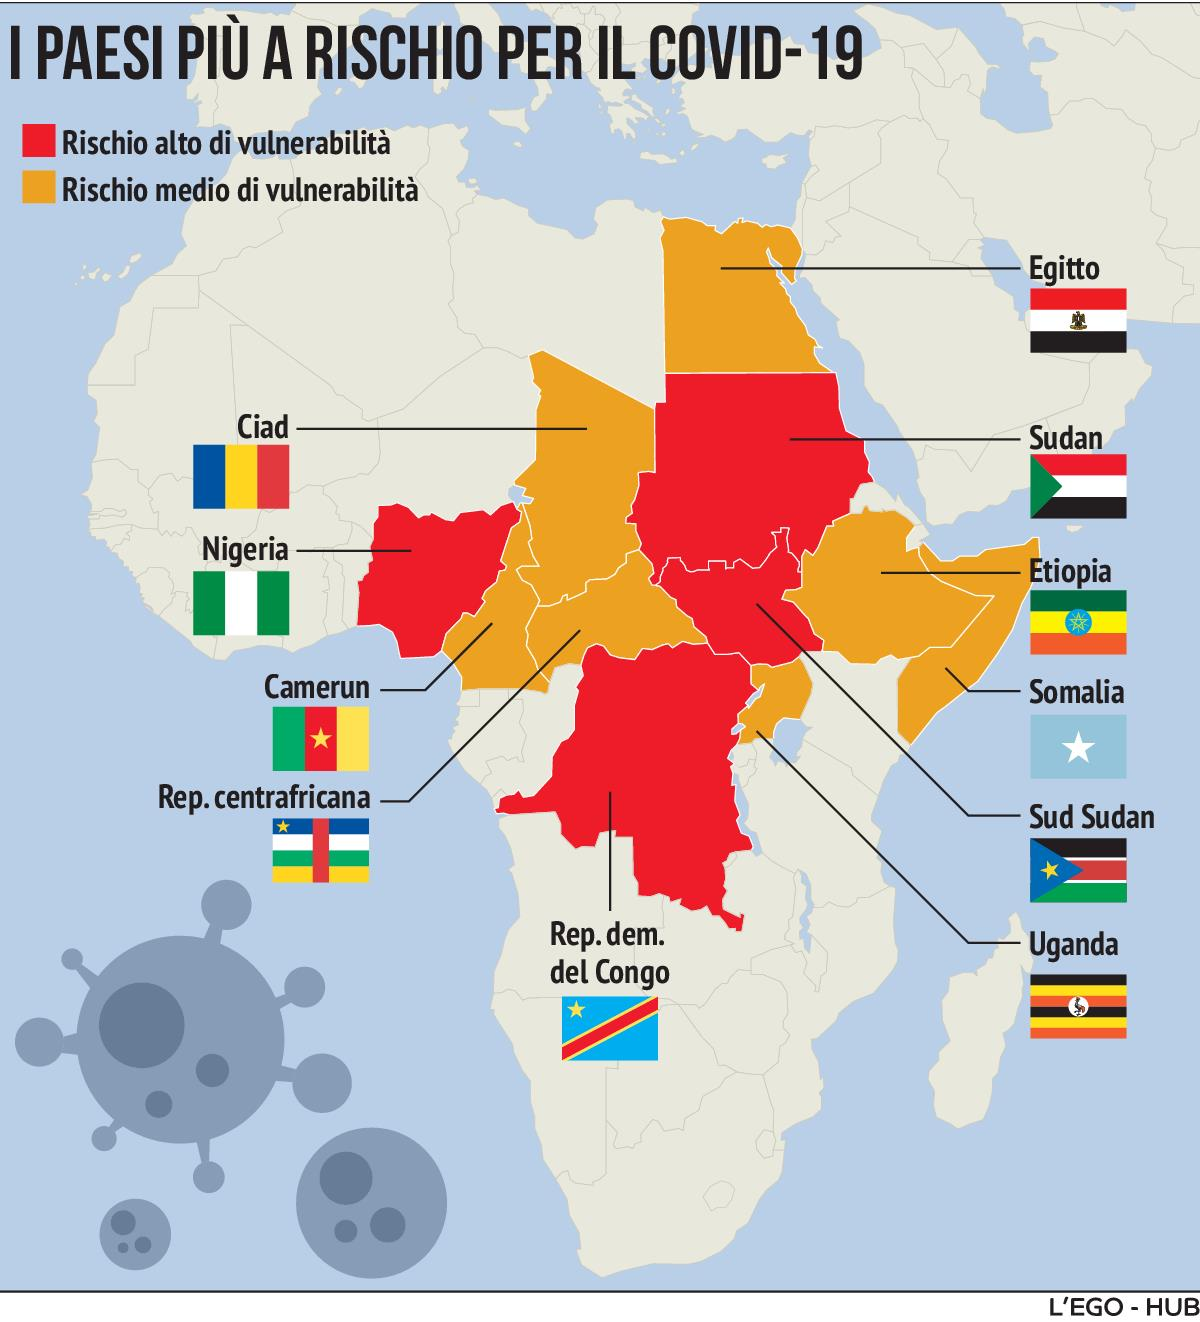 Cartina Africa Egitto.Coronavirus In Africa Ecco La Mappa Dei Paesi Piu A Rischio